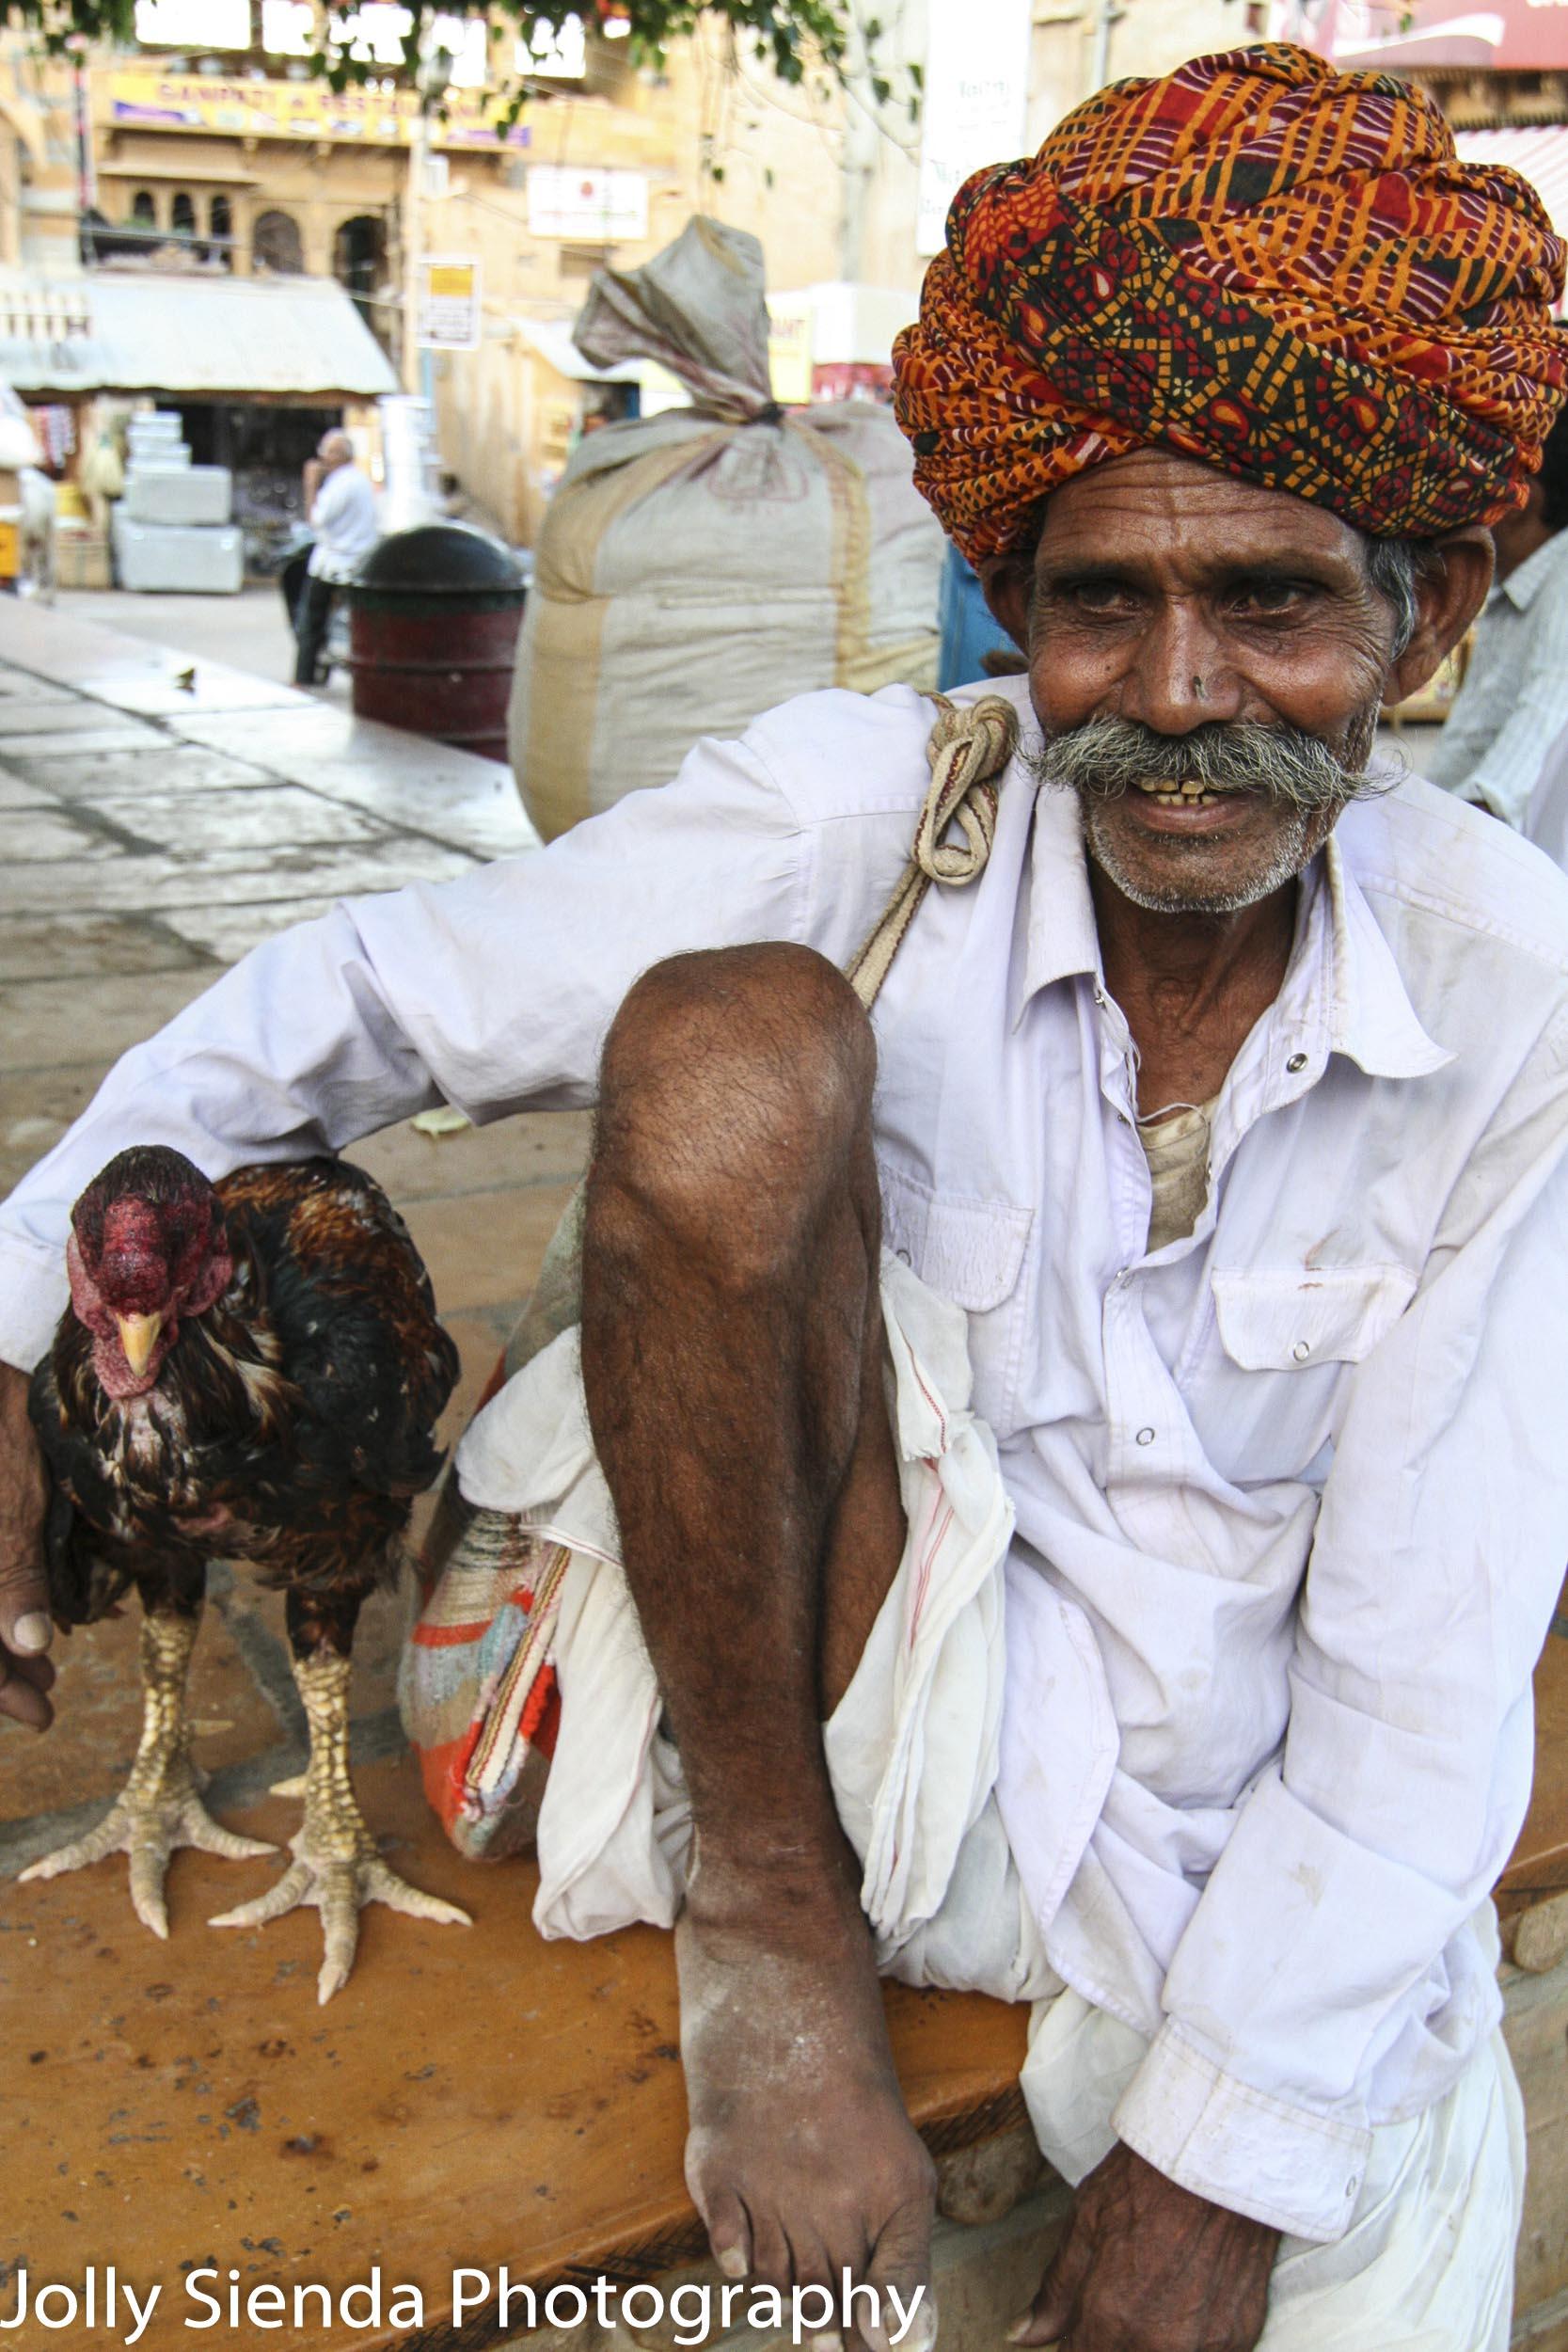 Chicken man wears a turban with his arm around his chicken